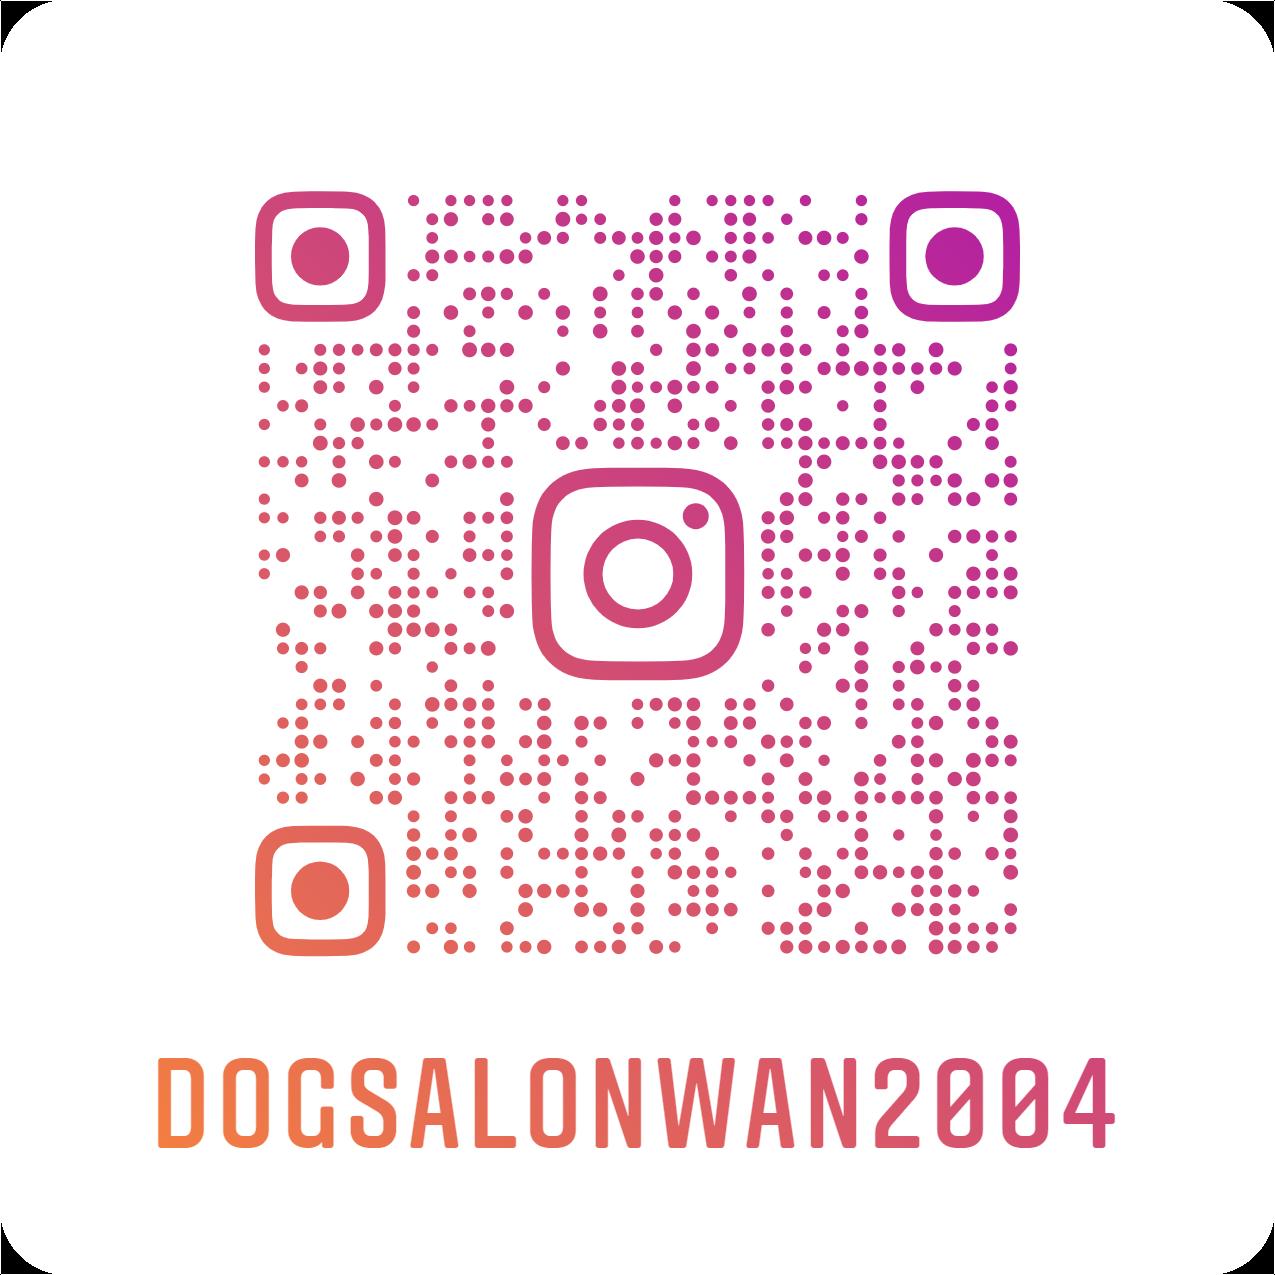 dogsalonwan2004_nametag_2021082913253586e_20211010151224a76.png